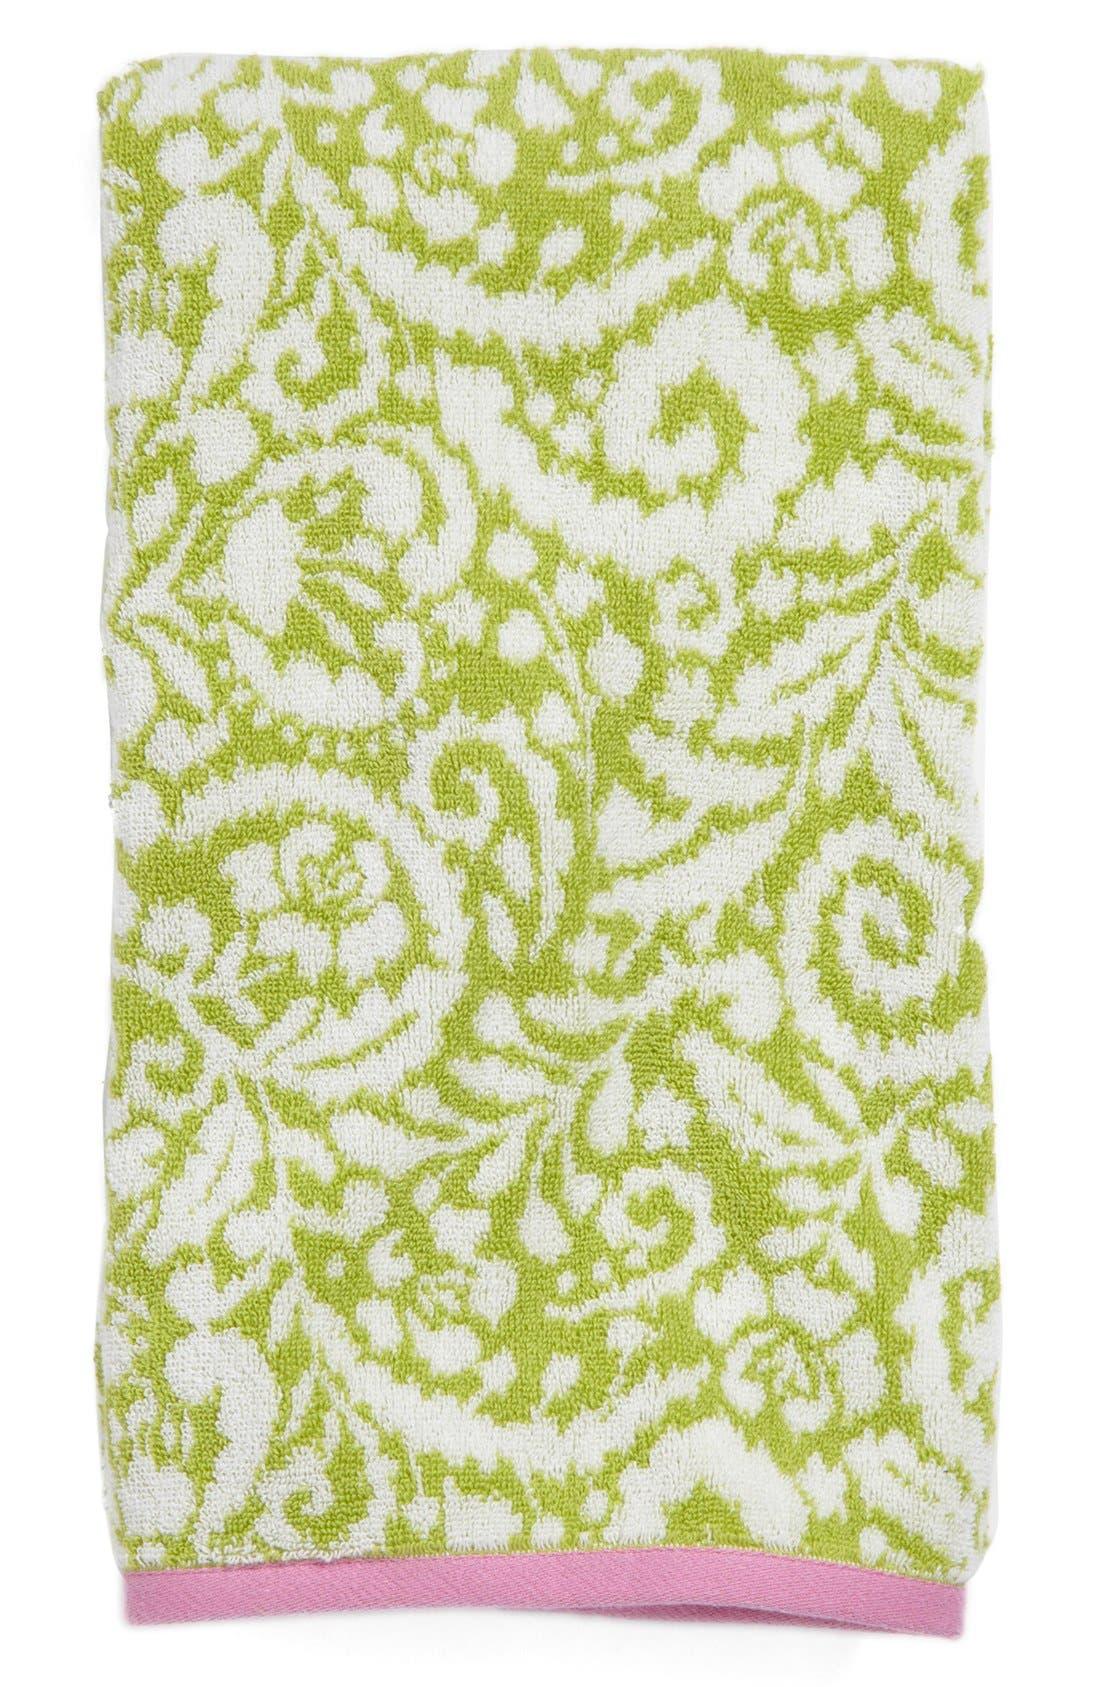 'Ikat' Jacquard Bath Towel,                         Main,                         color, Mlt